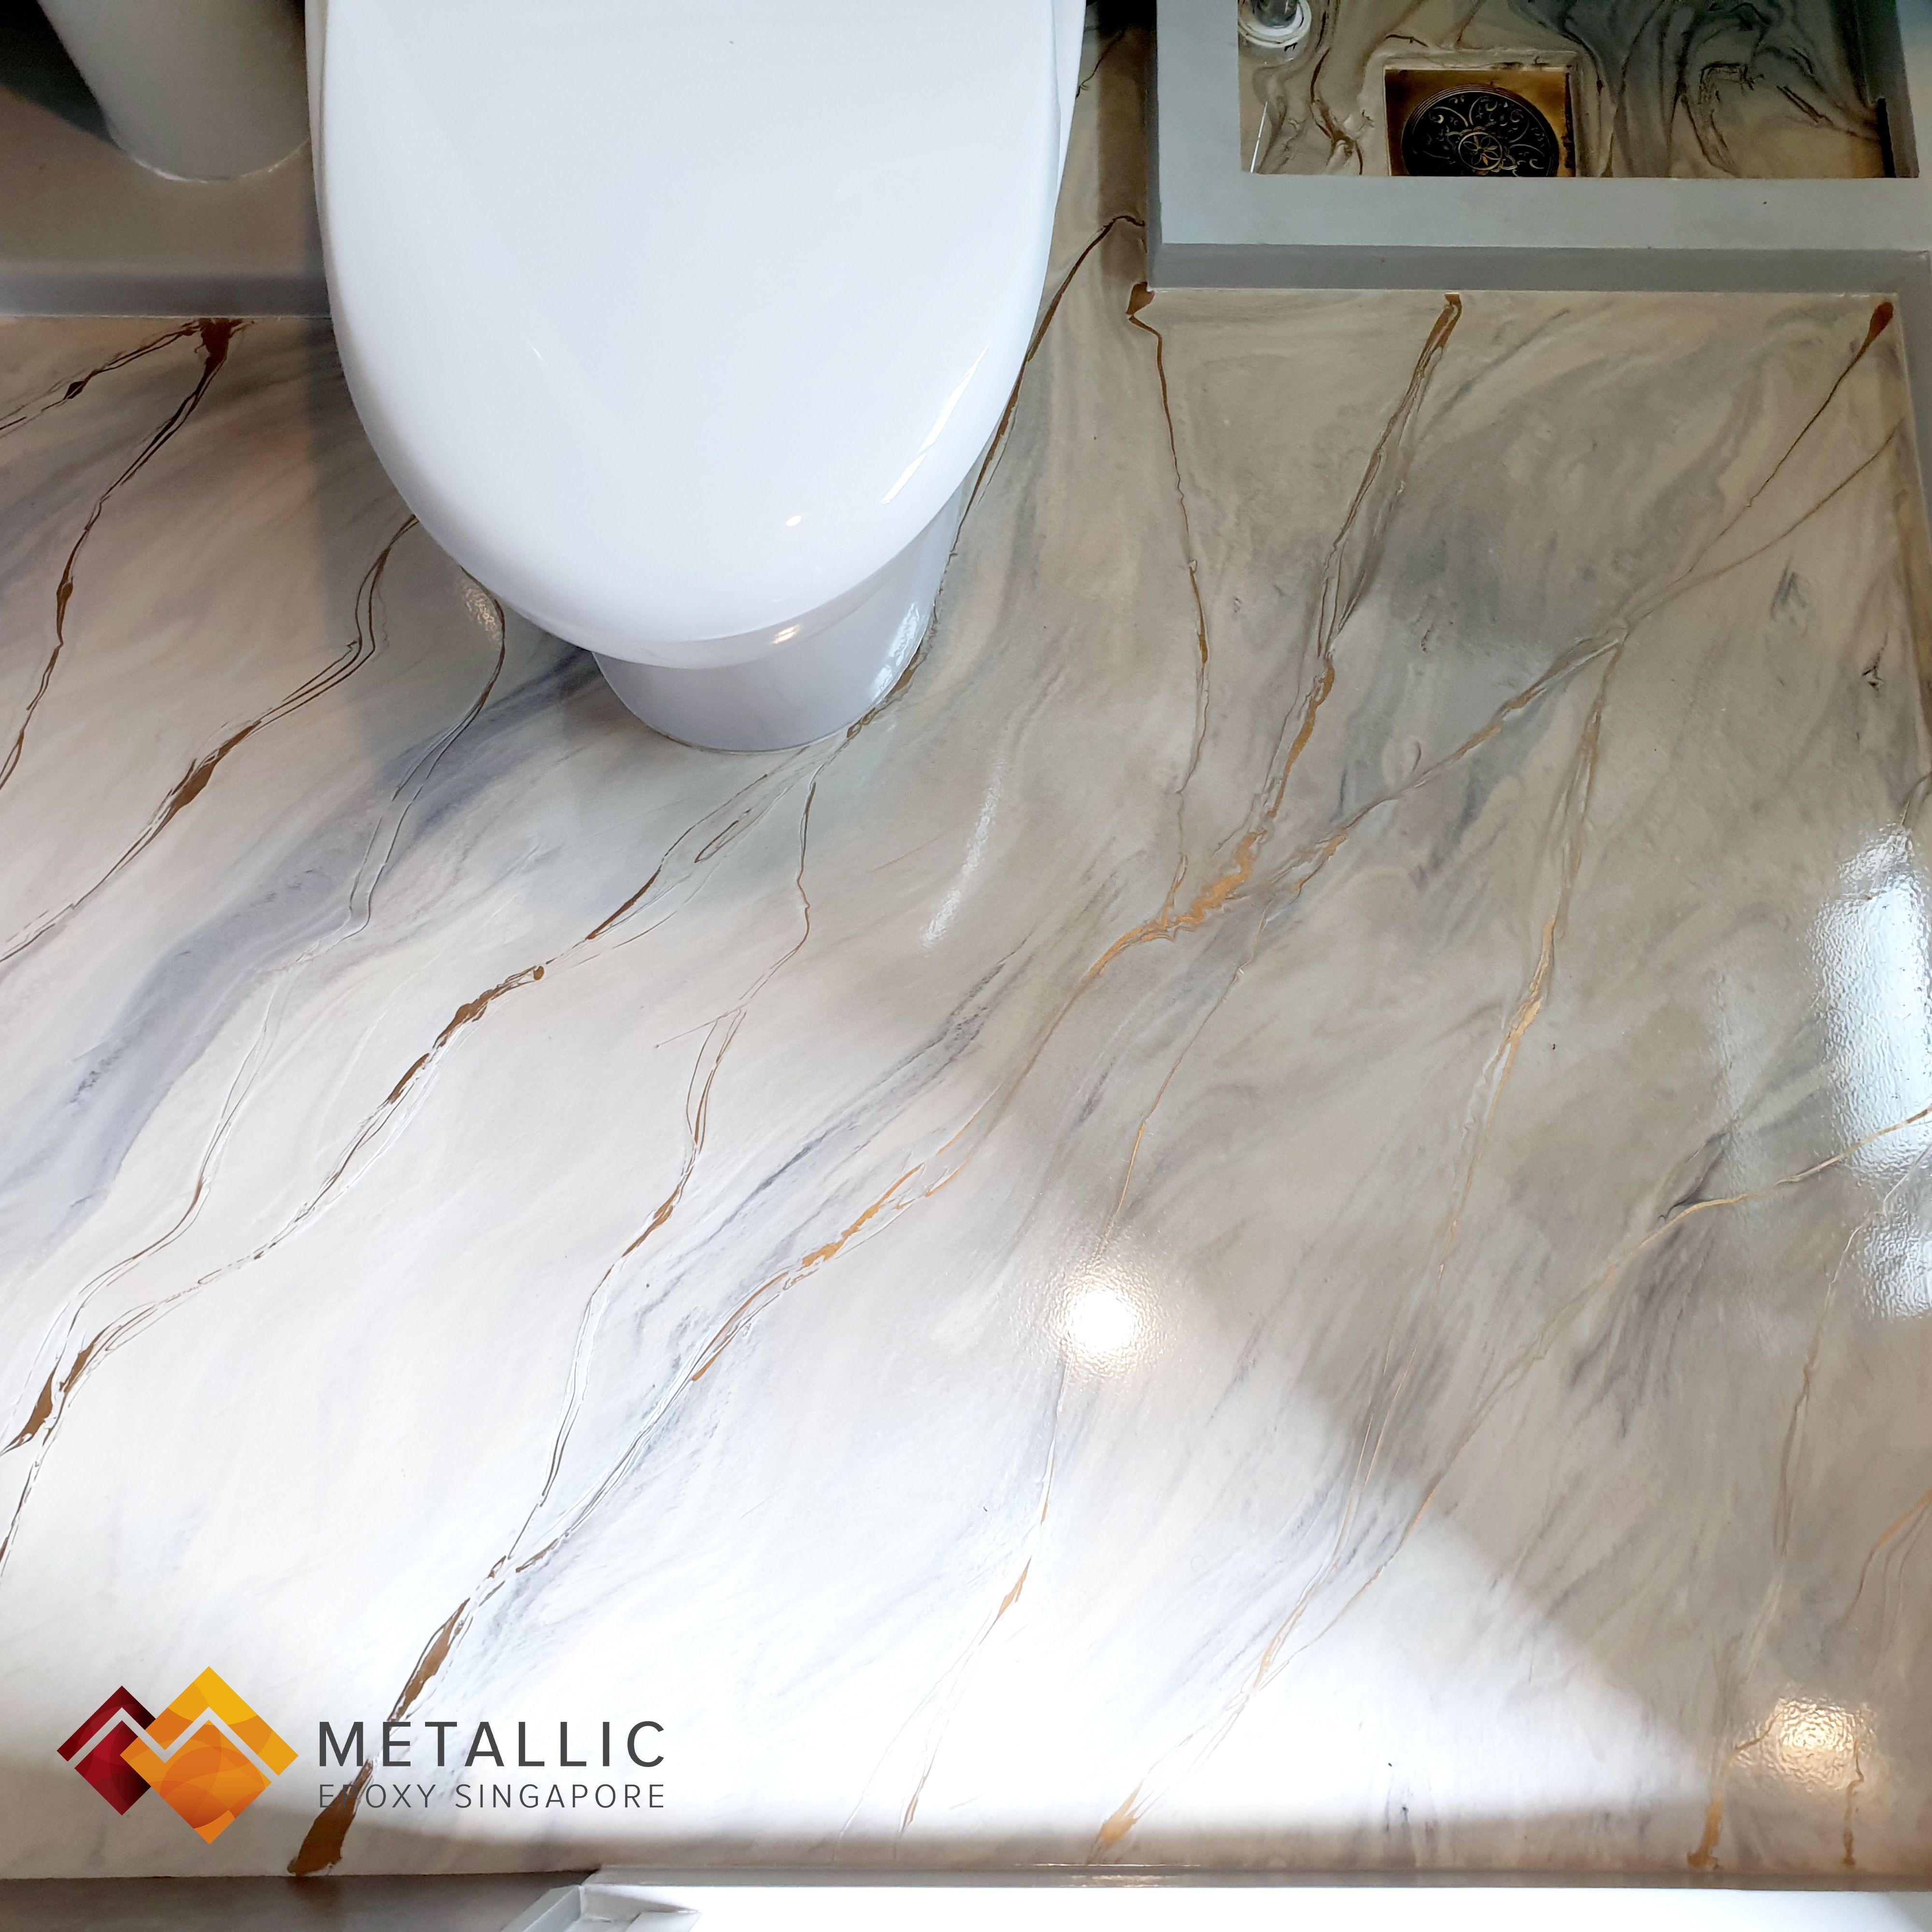 Metallic Epoxy Singapore Coffee Gold Highlights On Light Brown Base Bathroom Floor Bathroom Flooring Metallic Epoxy Floor Epoxy Floor